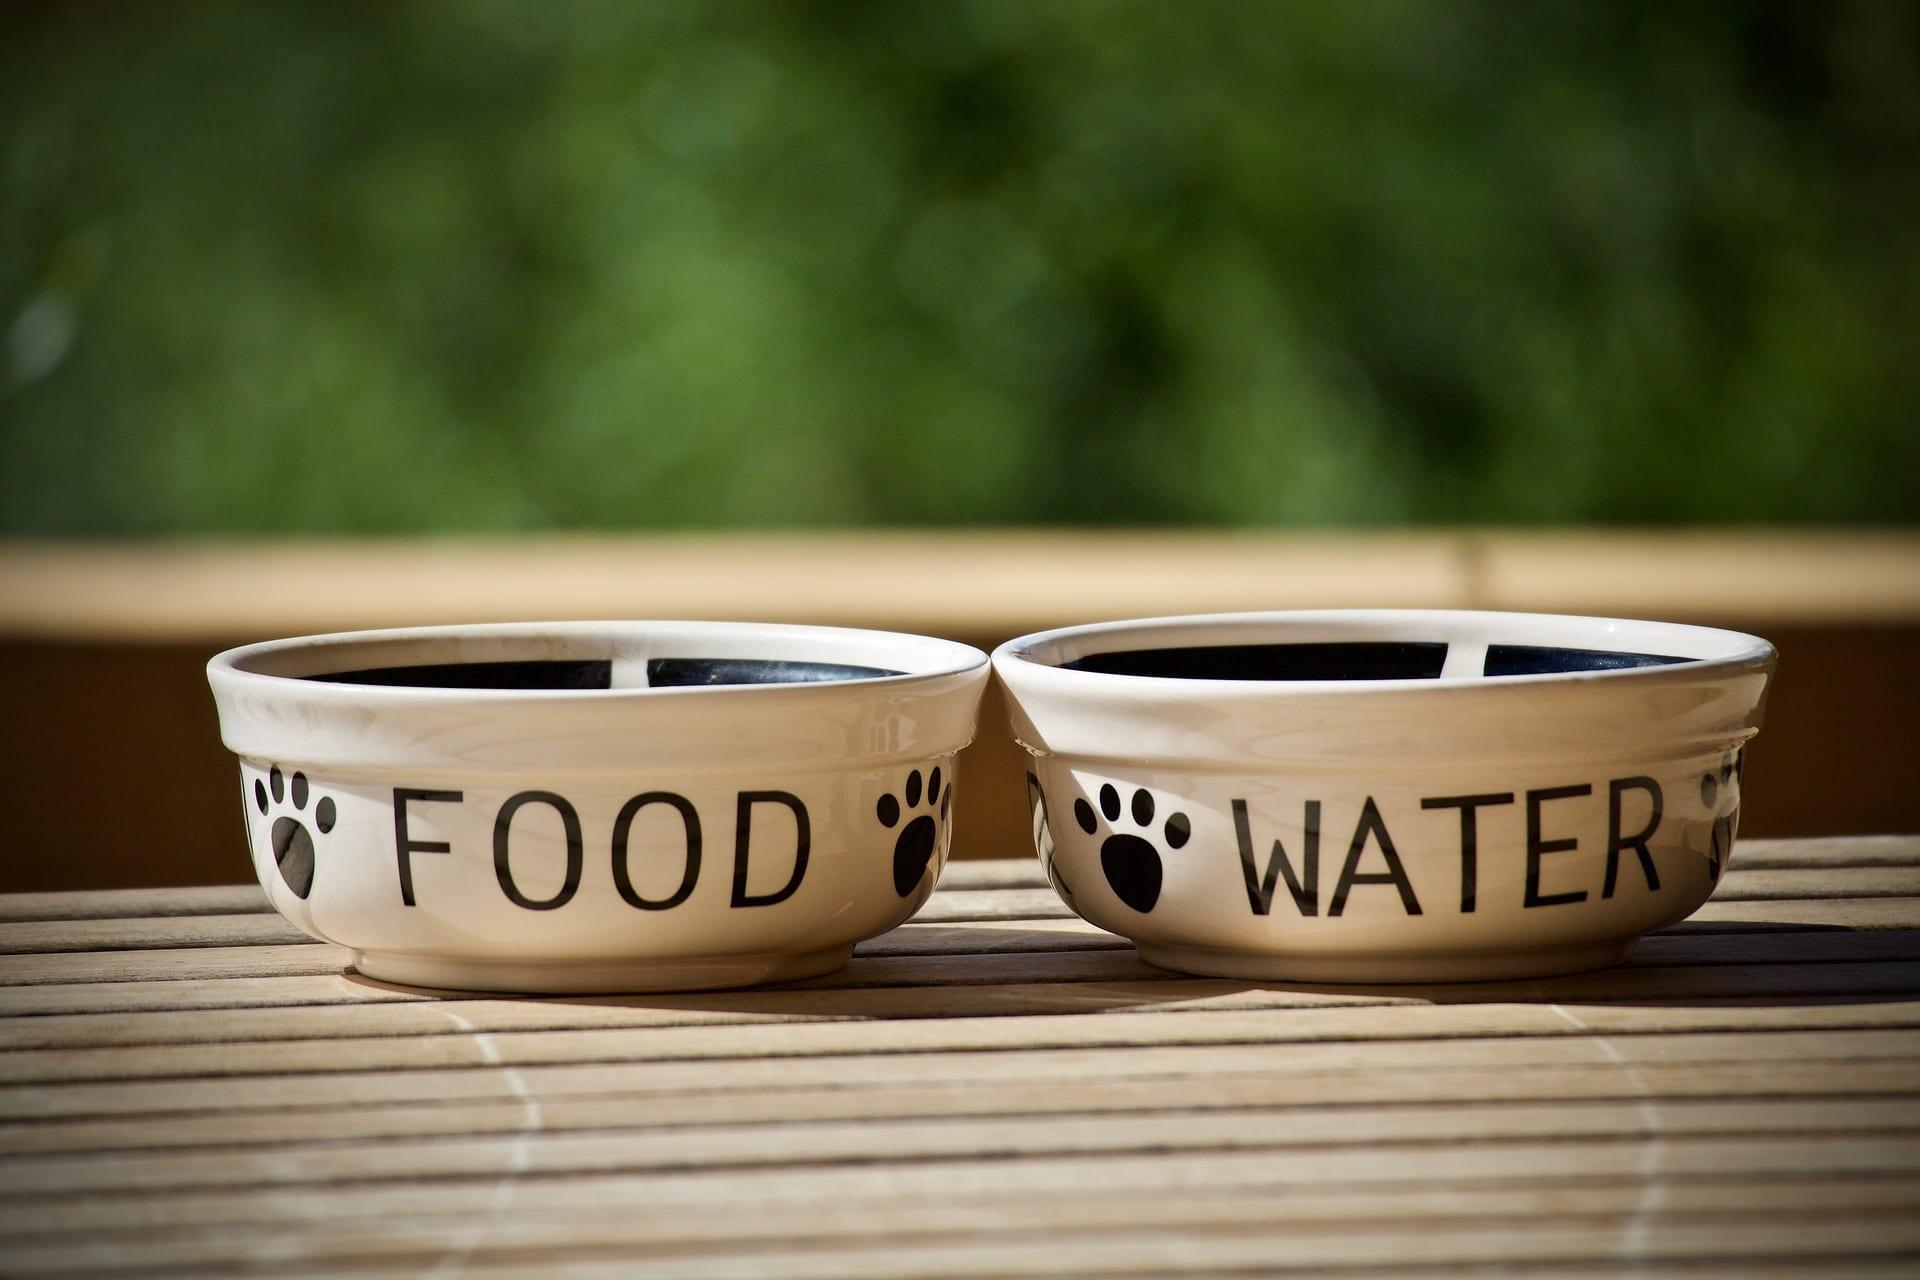 Take water and dog treats